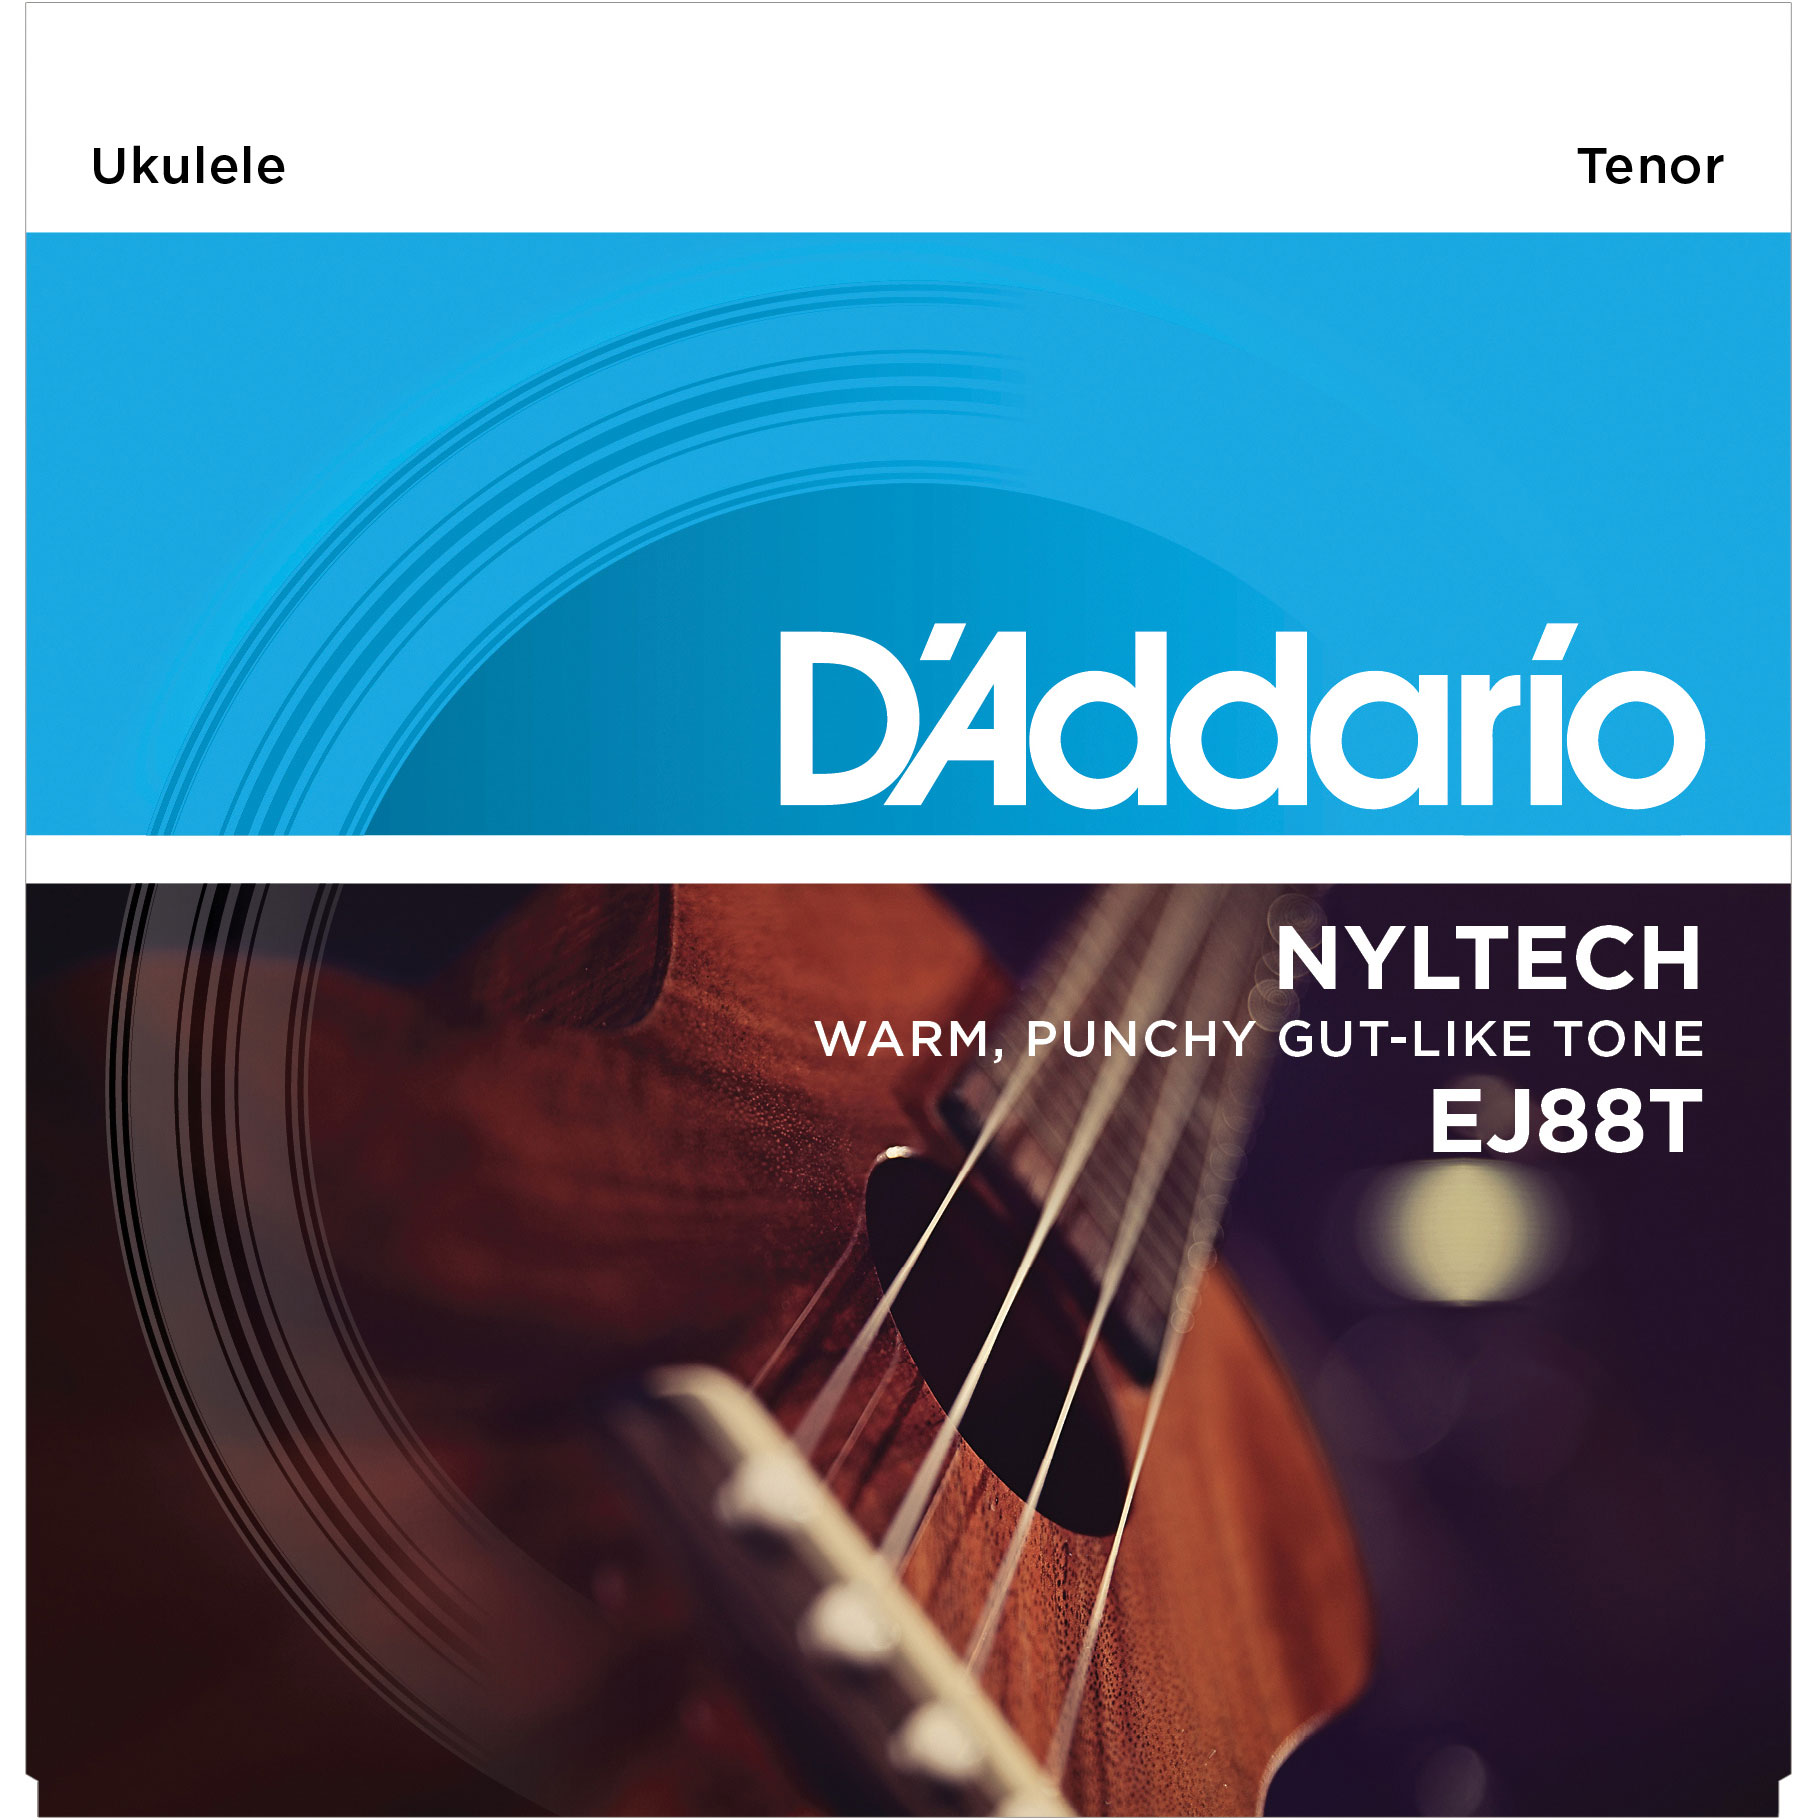 DADDARIO EJ88T NYLTECH TENOR